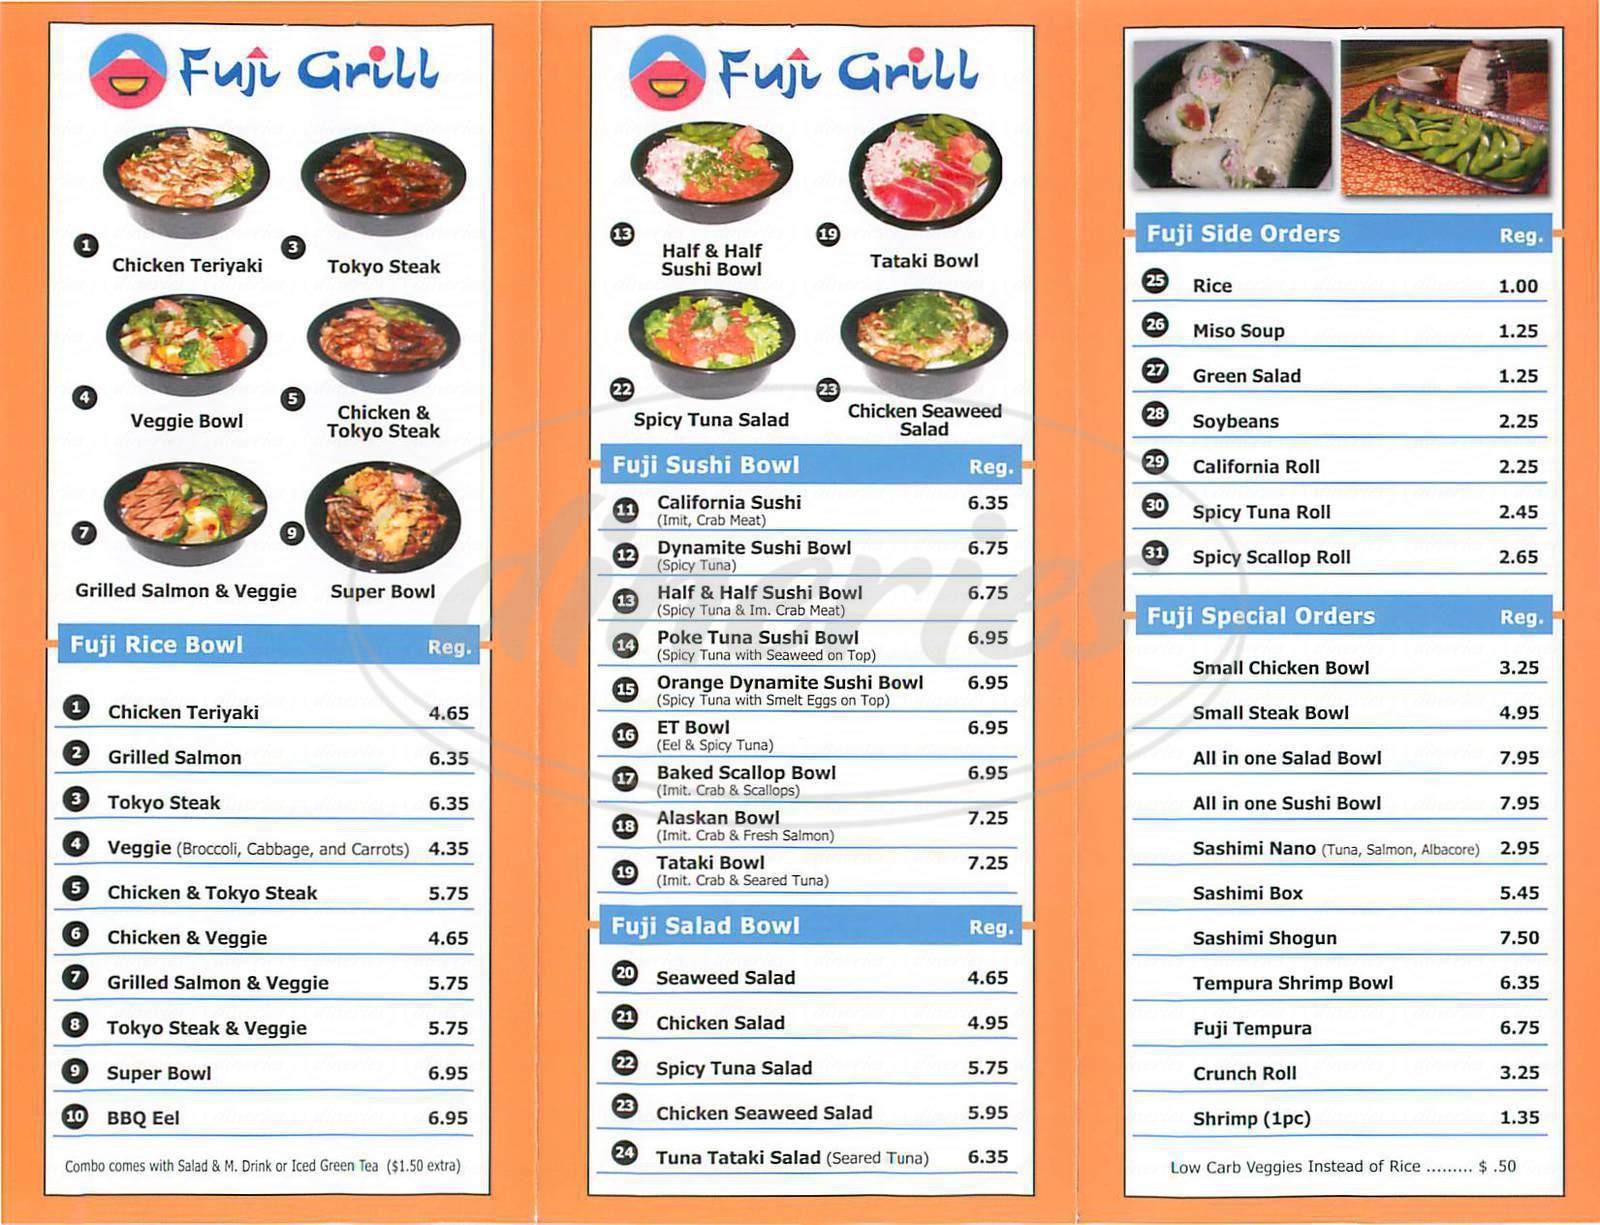 menu for Fuji Grill